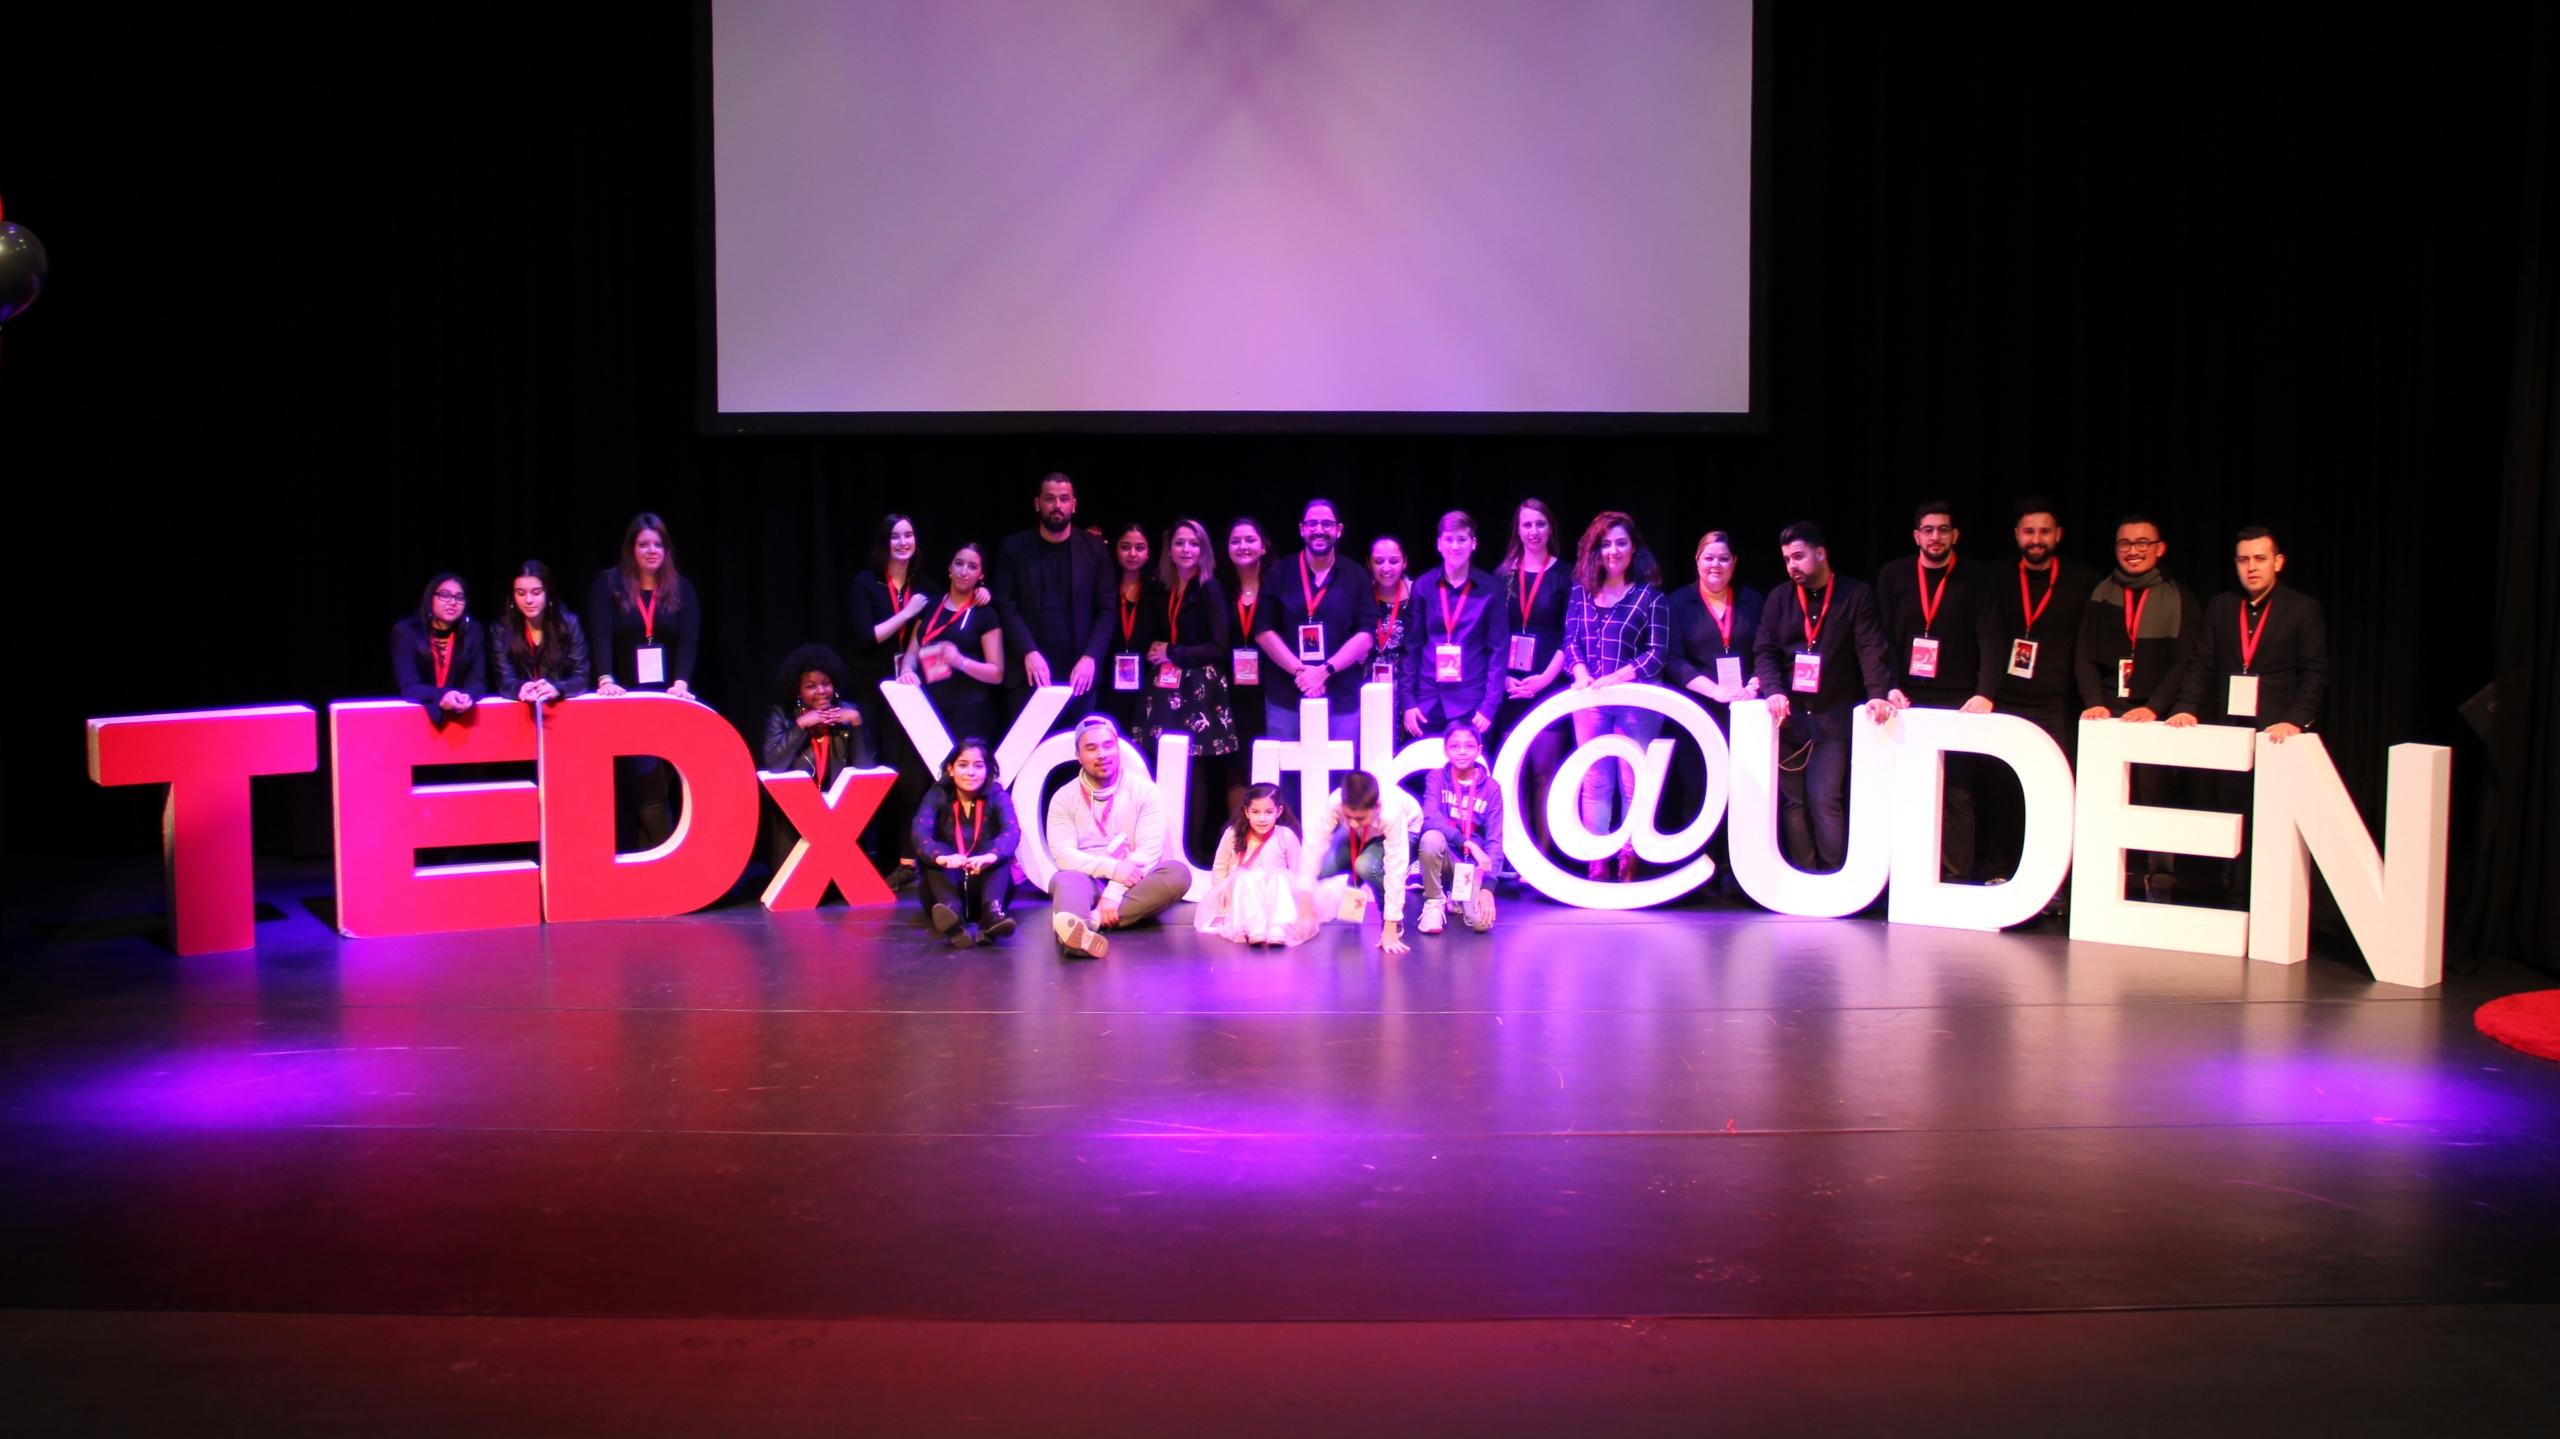 TEDxYouth@Uden